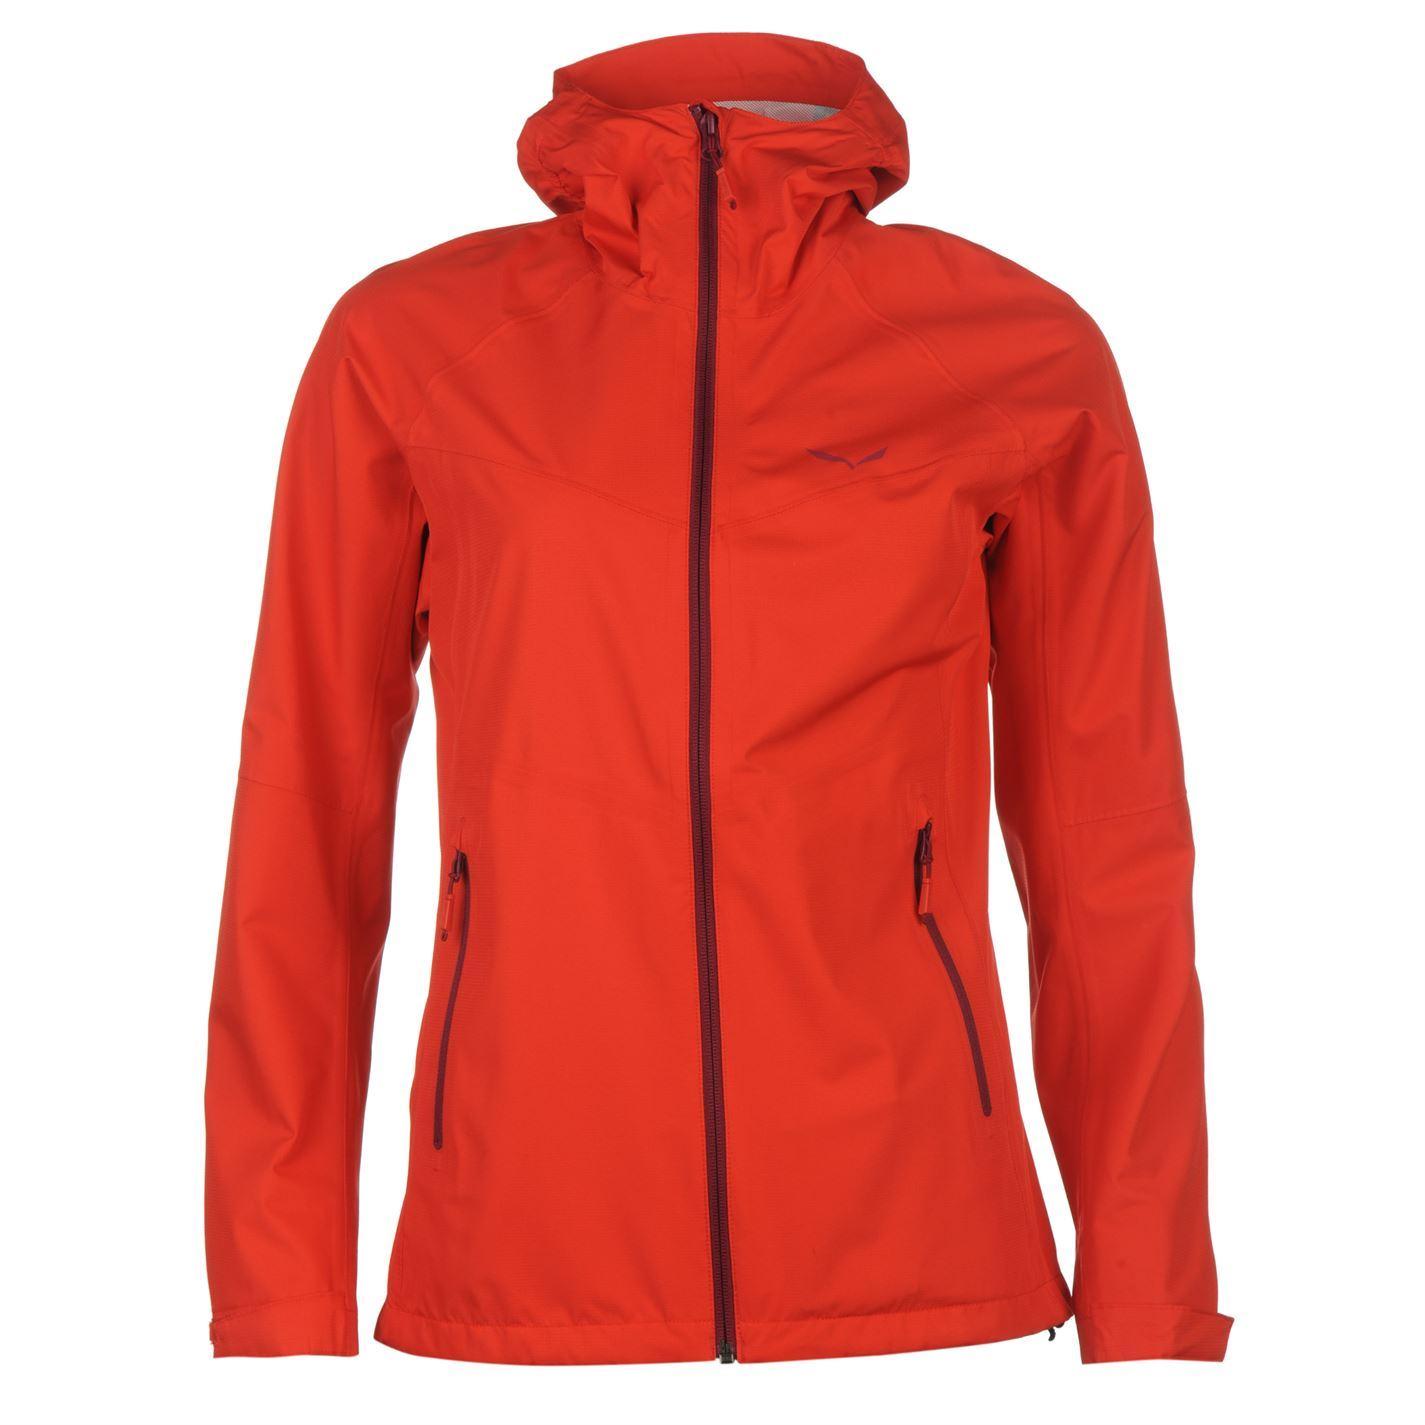 Details about Salewa Puez Aqua PowerTex Jacket Womens Coat Hiking Outdoors Outerwear